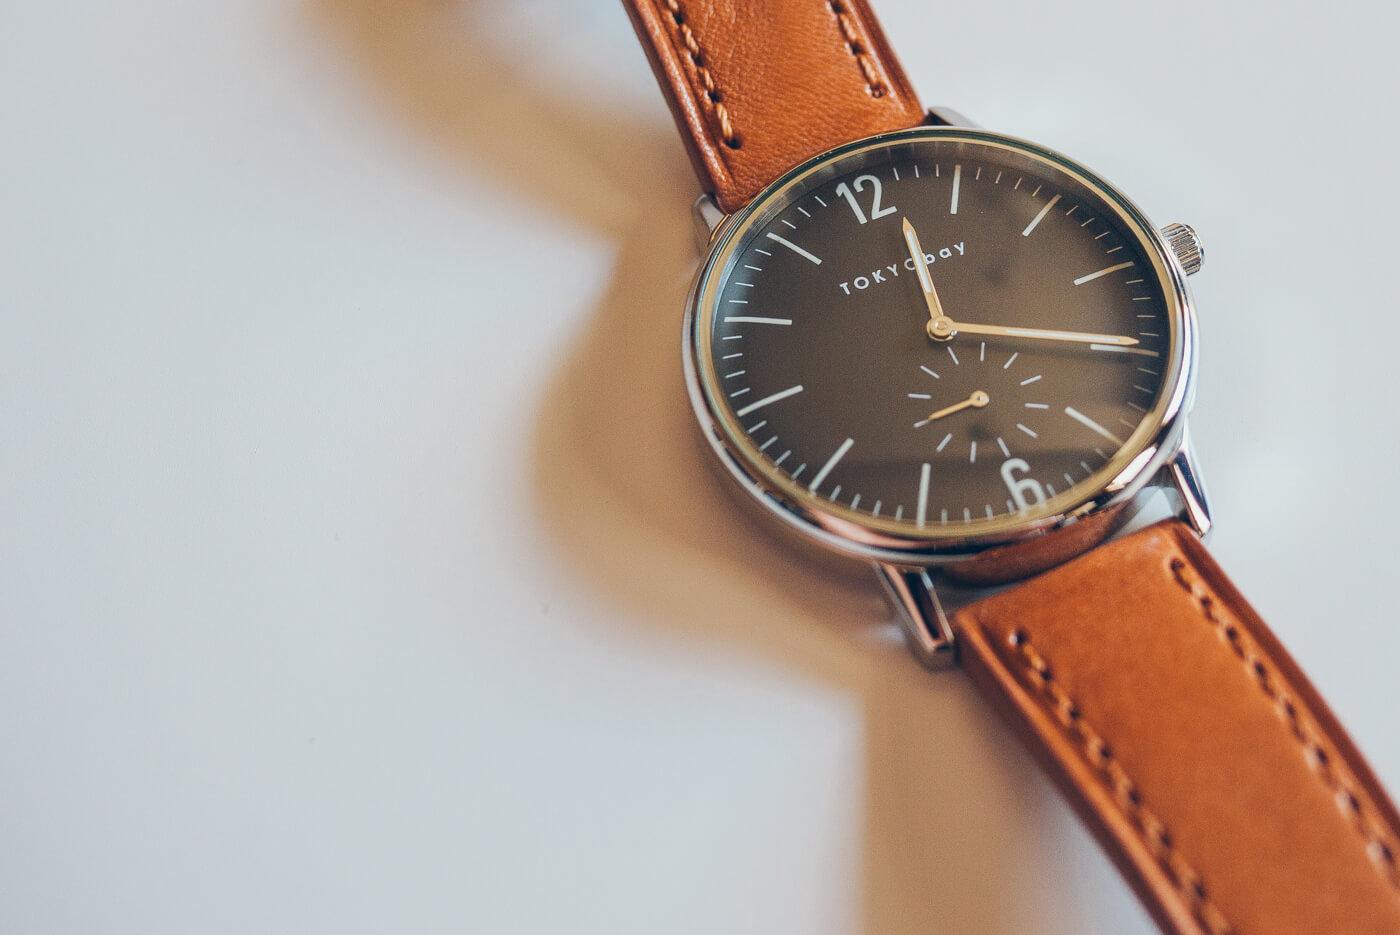 Tokyobay Grant - A simple, dark watch for minimalists